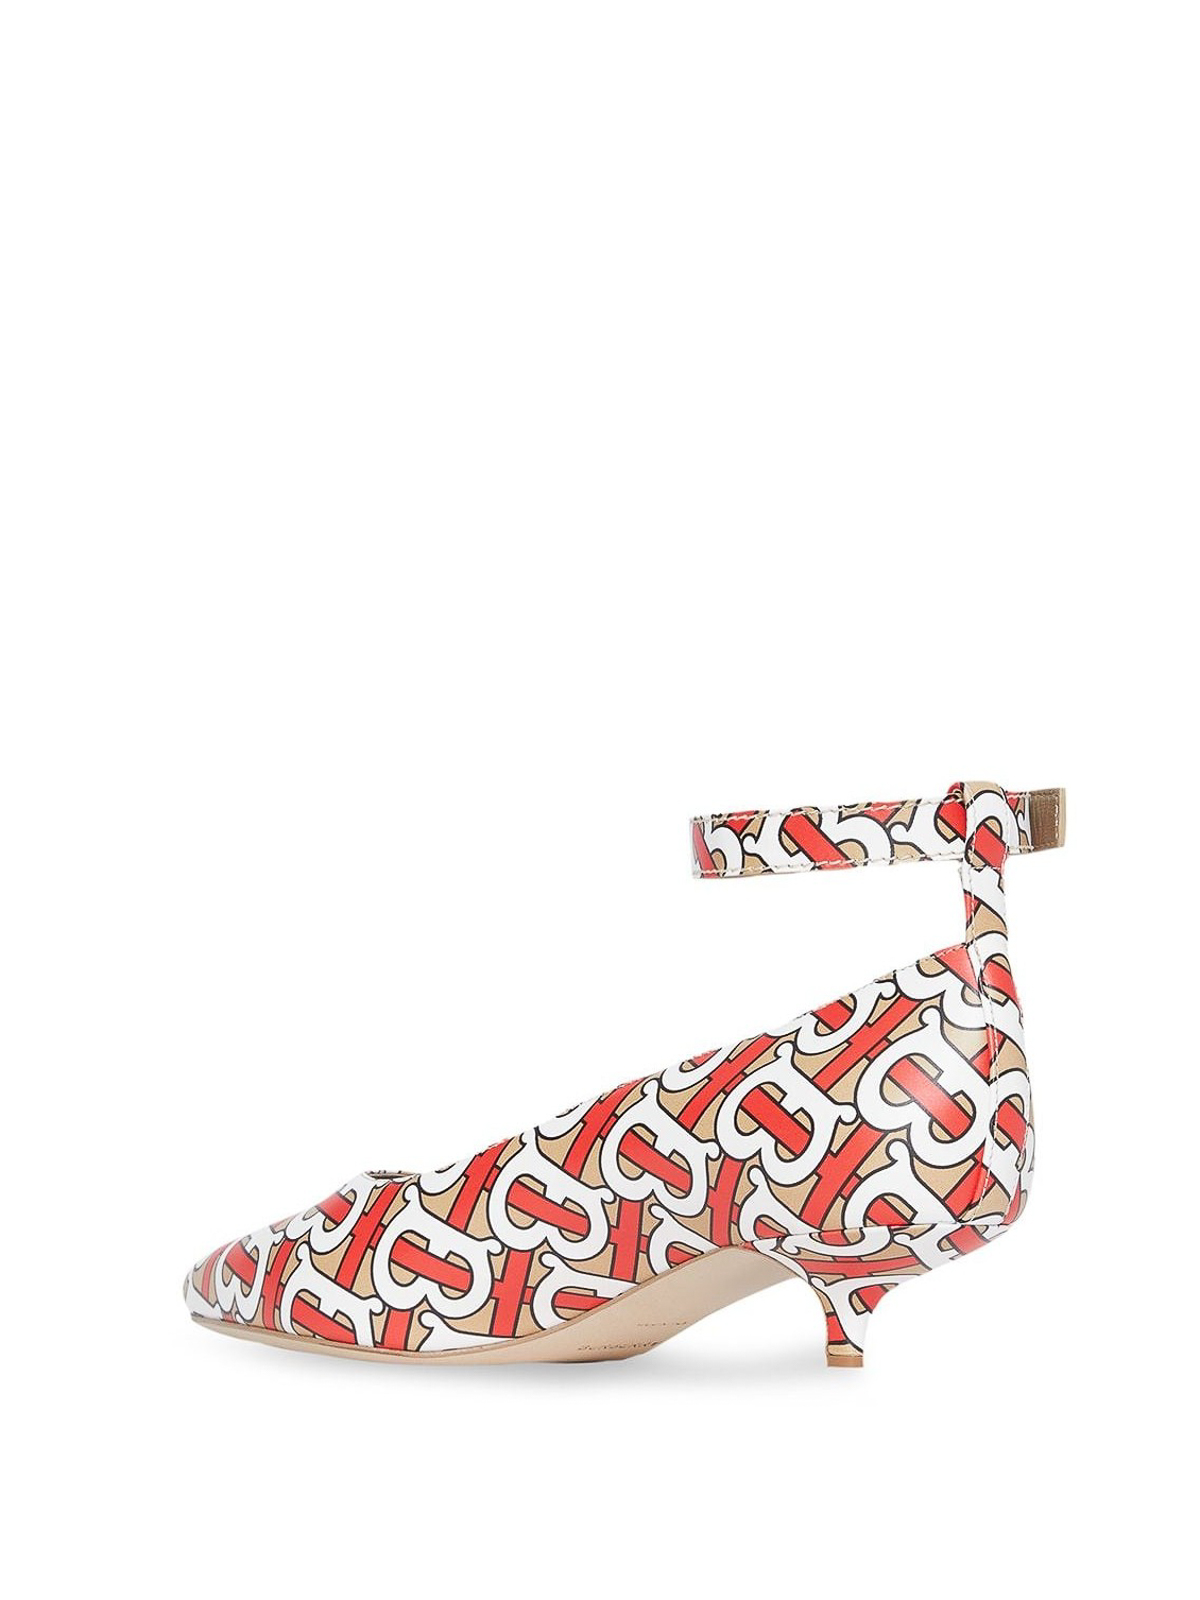 0154ca8c24 Burberry - Monogram print leather peep toe pumps - court shoes - 8012562